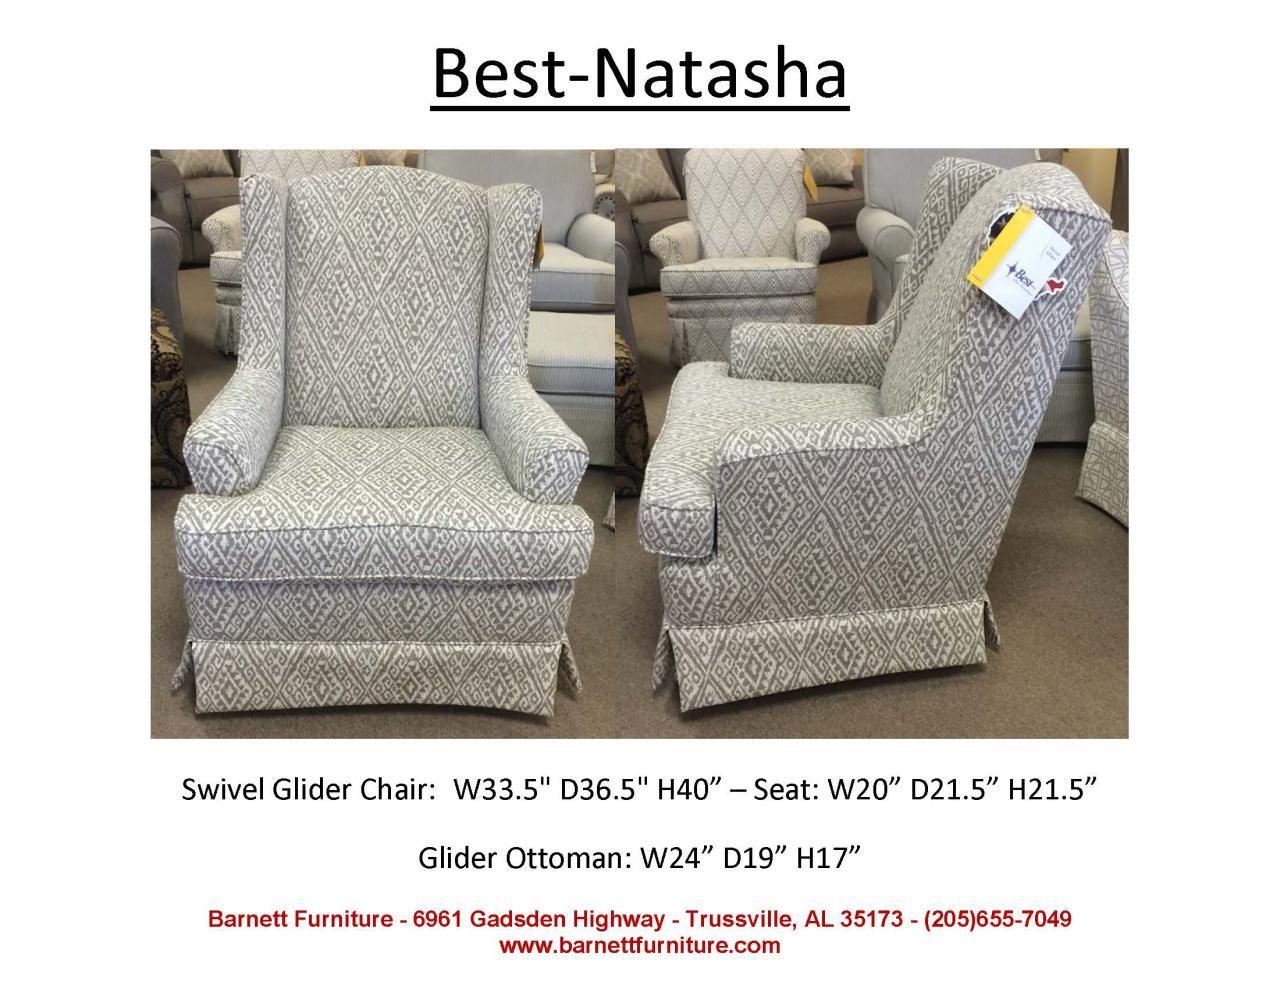 best chairs geneva glider weight limit leap chair v2 vs v1 home furnishings natasha swivel you choose